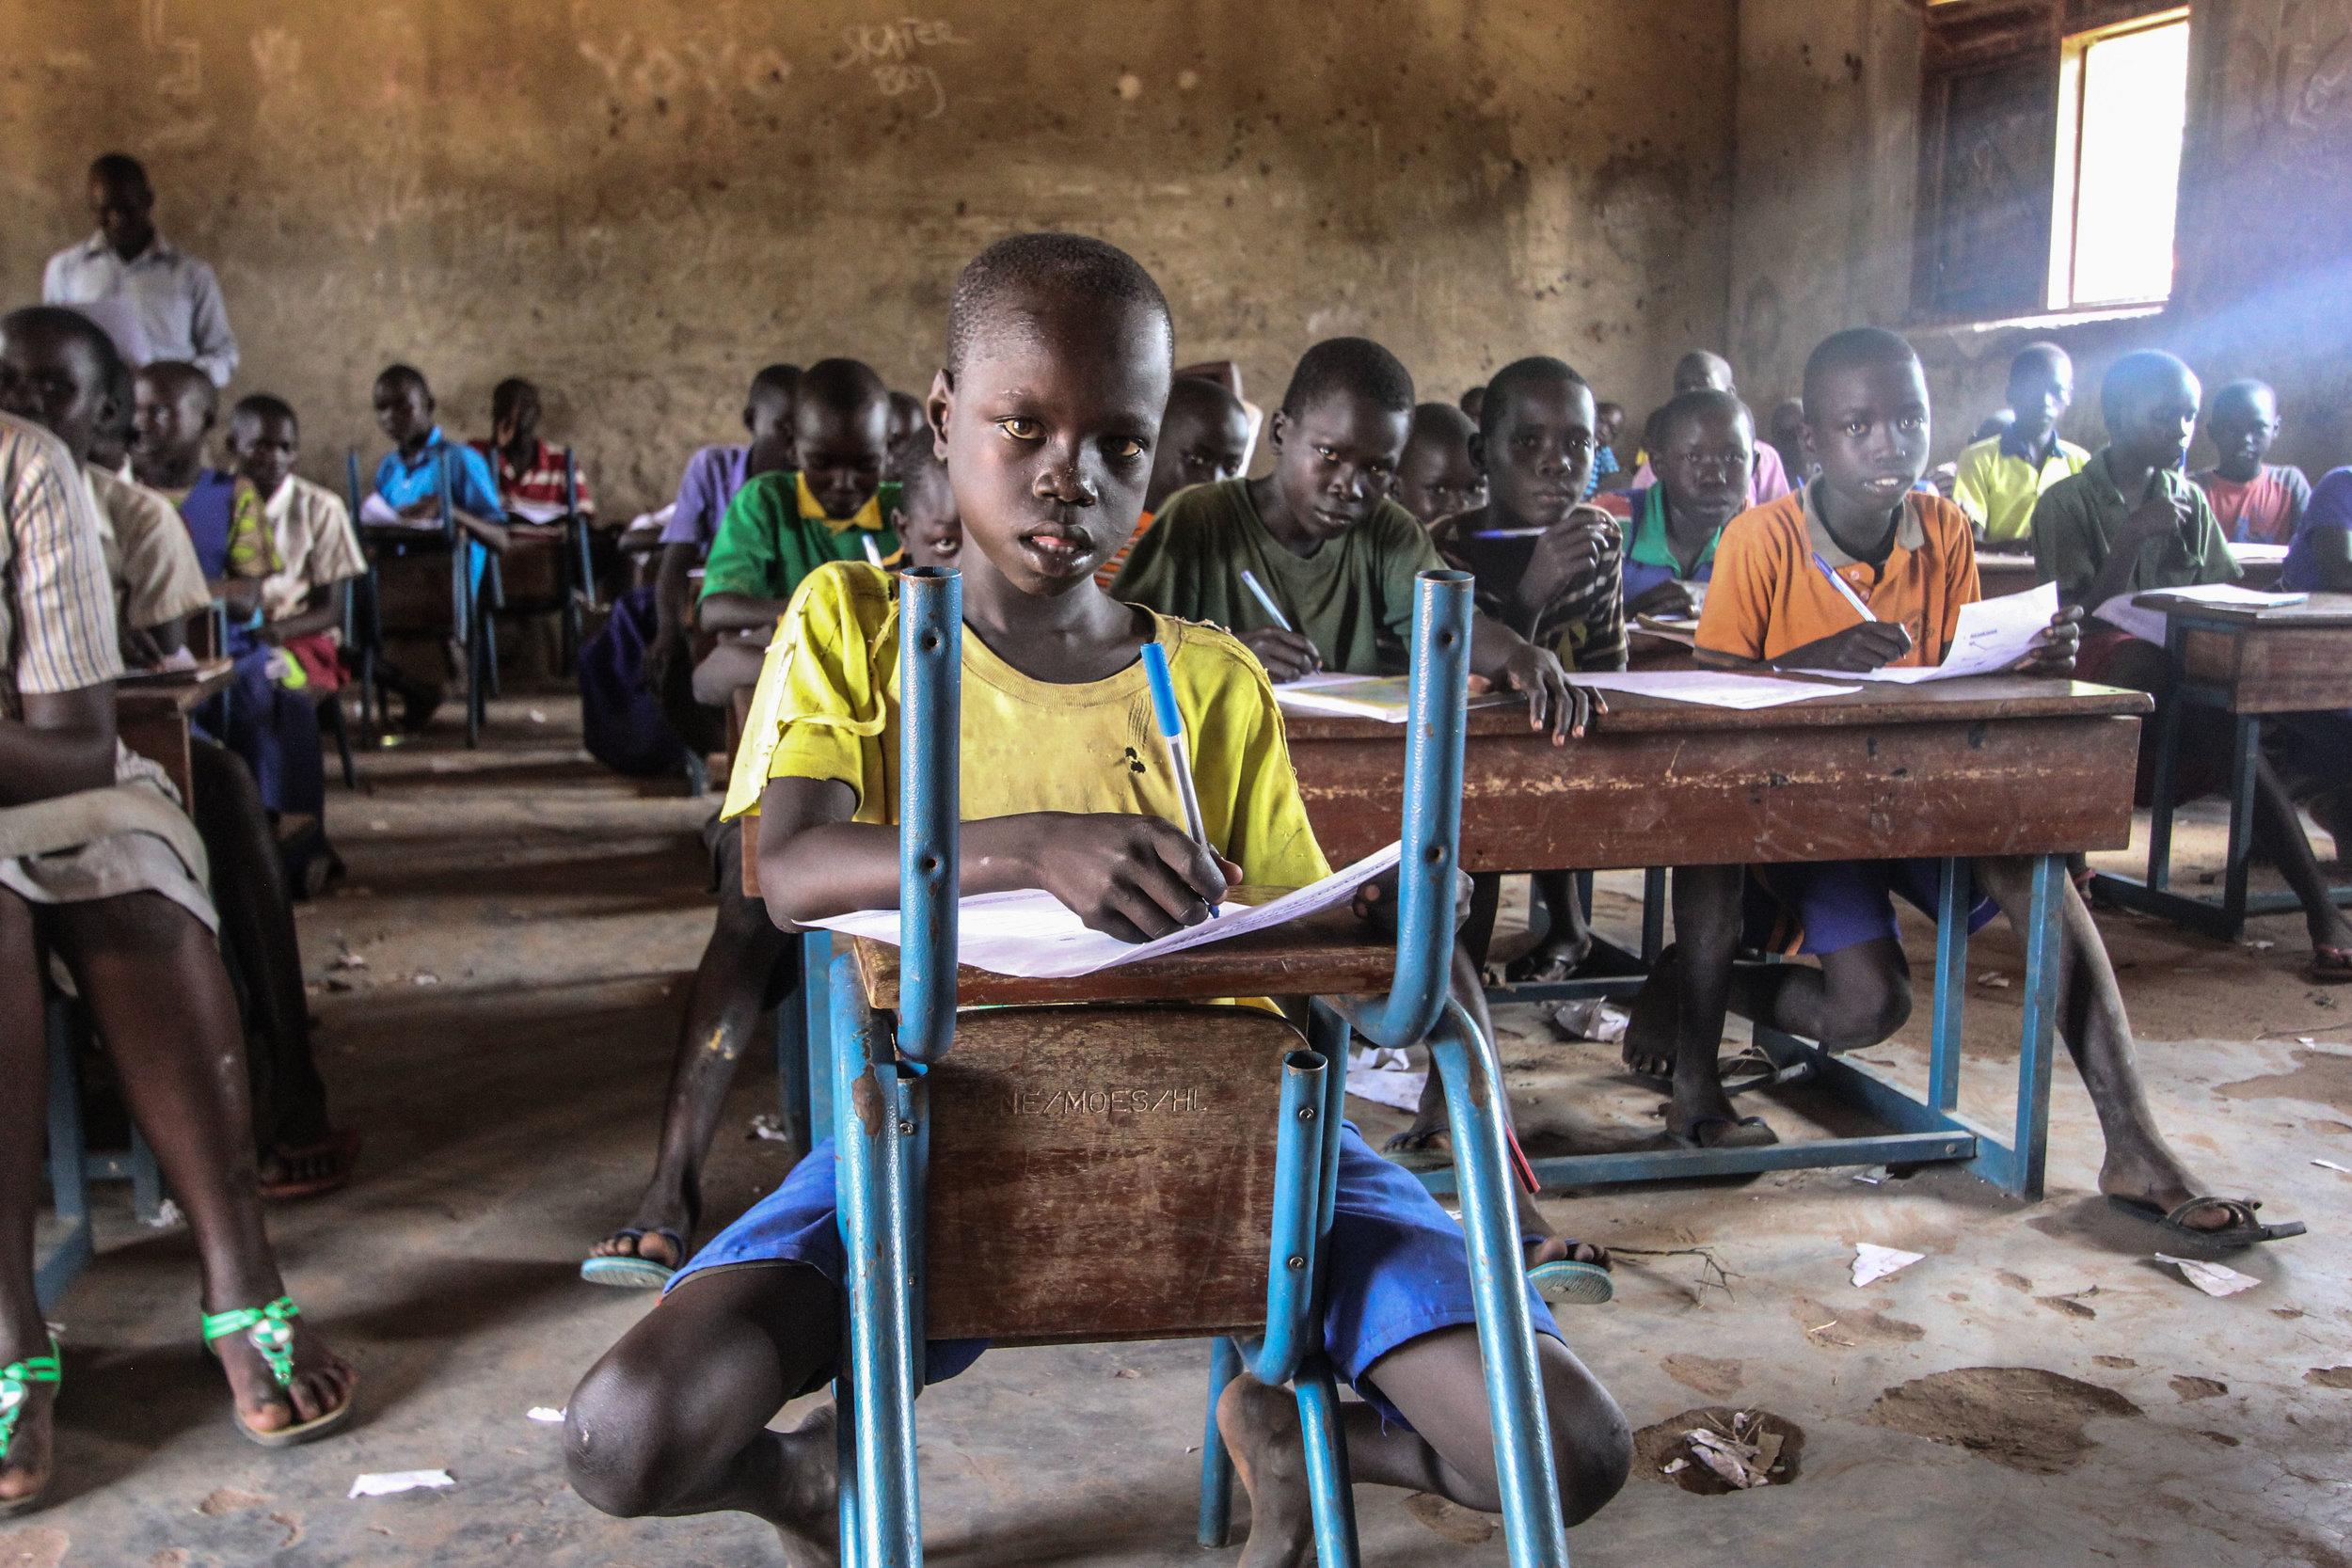 Warchild Canada // South Sudanese children in Uganda April 2017